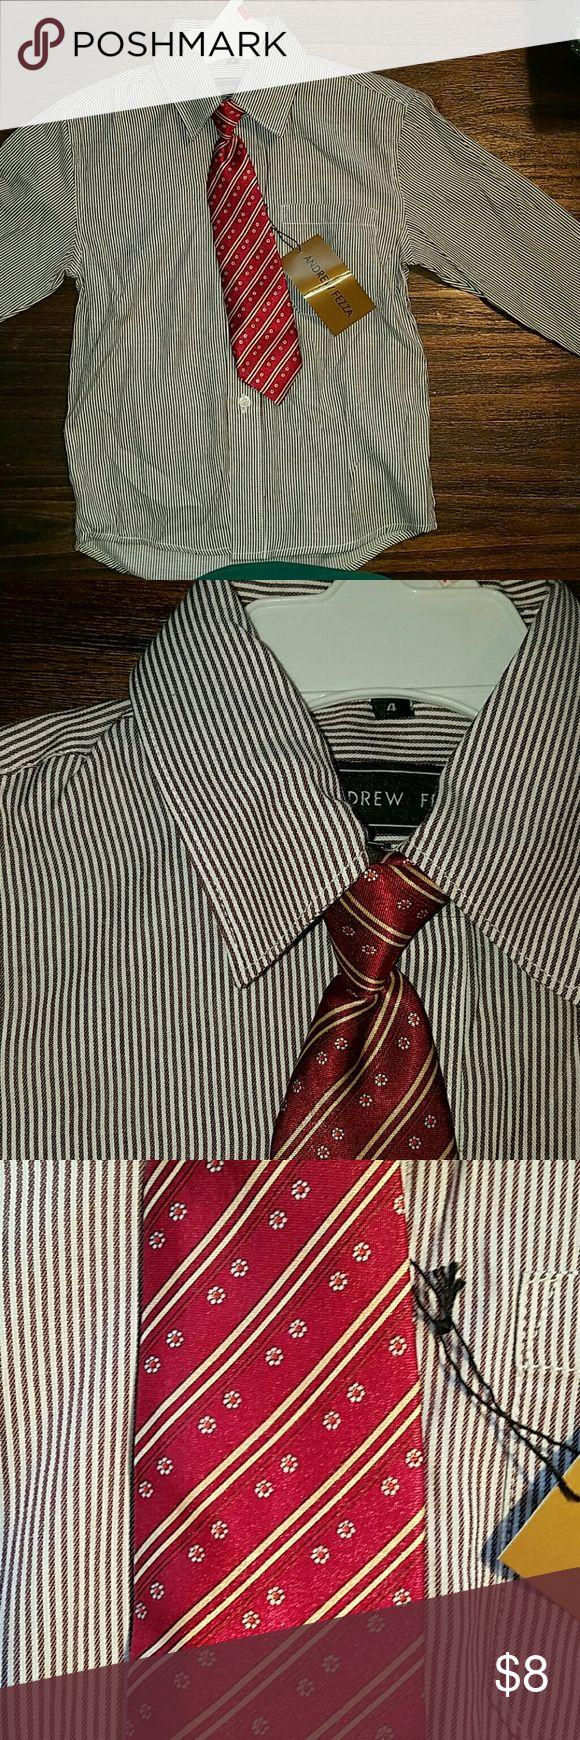 1000 Ideas About Dress Shirt And Tie On Pinterest Shirt